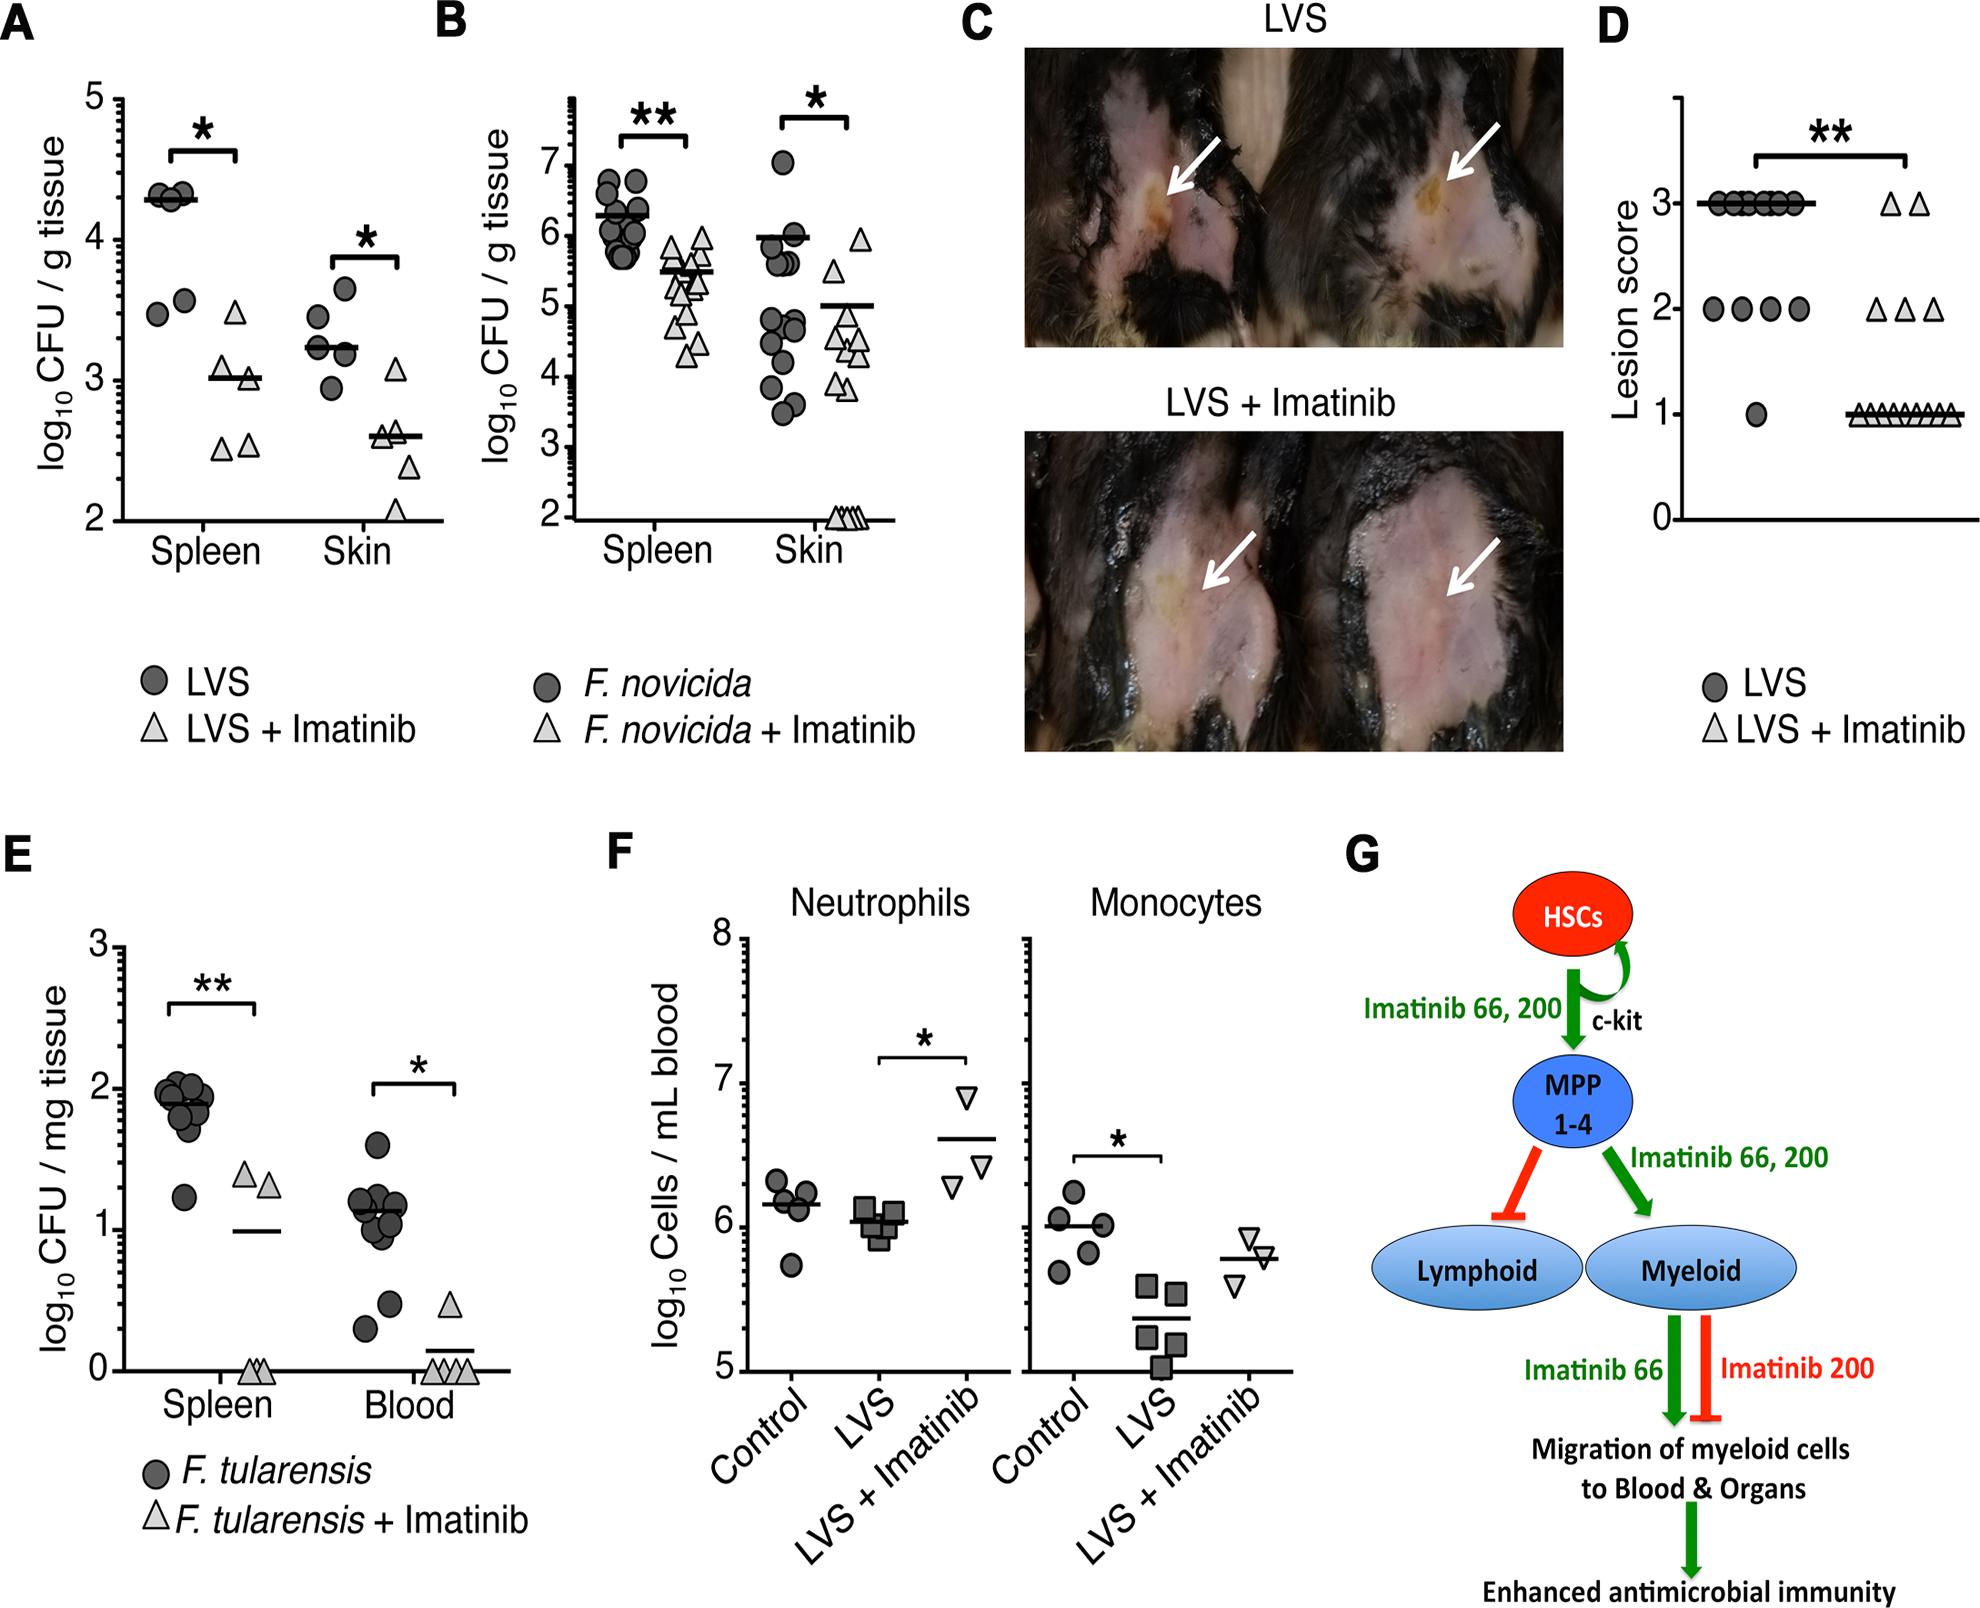 Imatinib decreases bacterial load of pathogenic <i>Francisella spp</i>. <i>in vivo</i>.